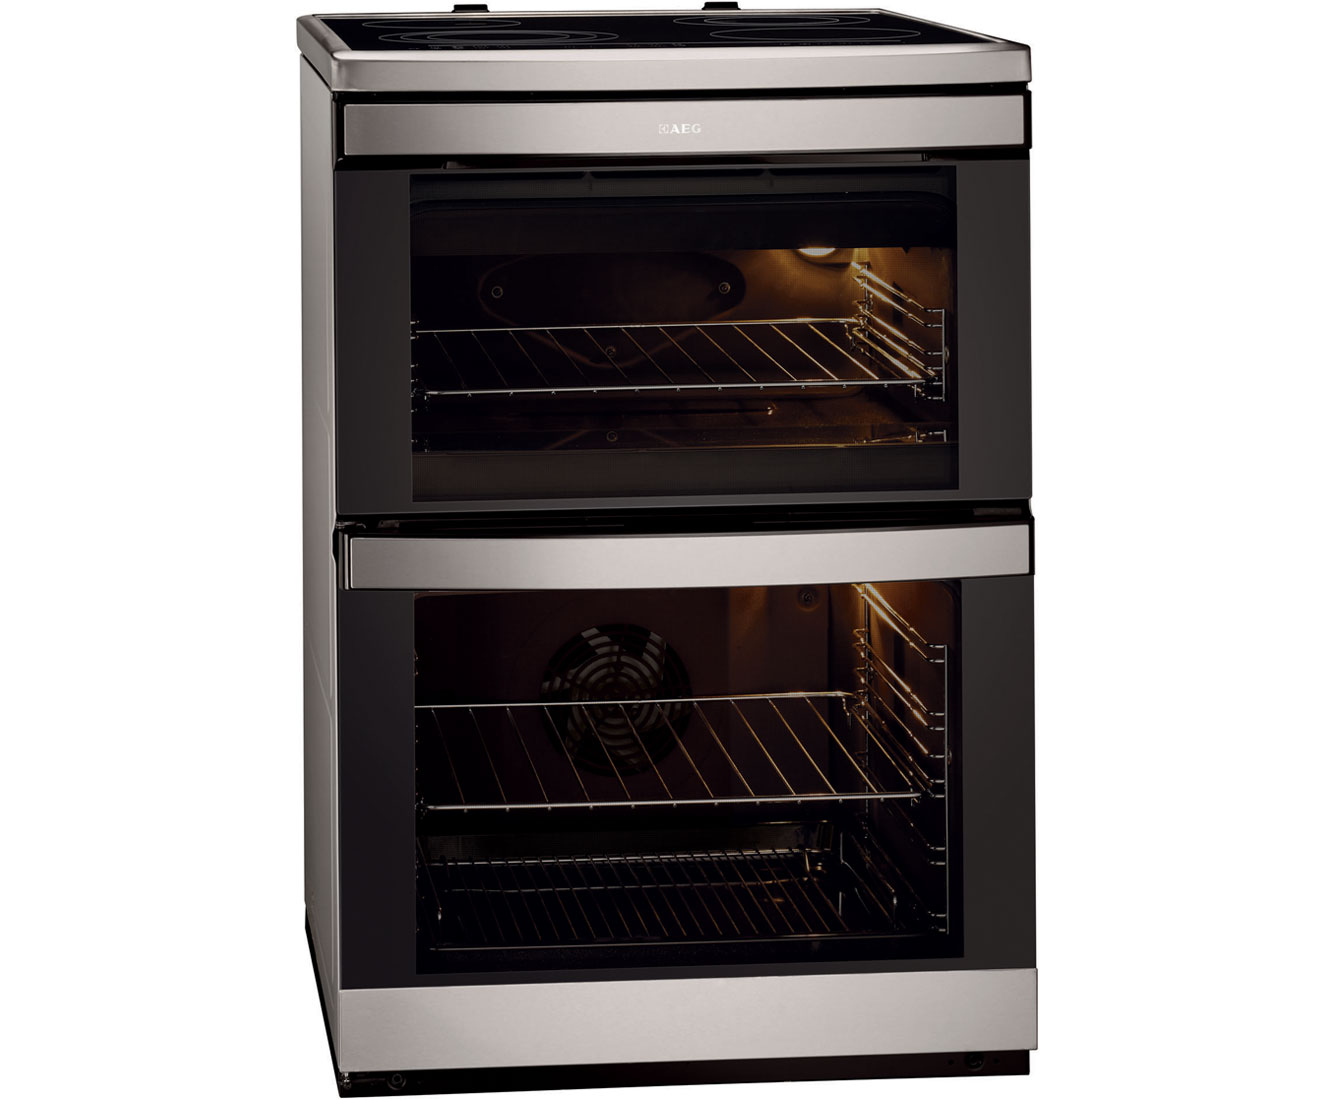 Uncategorized Aeg Kitchen Appliances Review customer reviews aeg 49002vmn electric cooker stainless steel